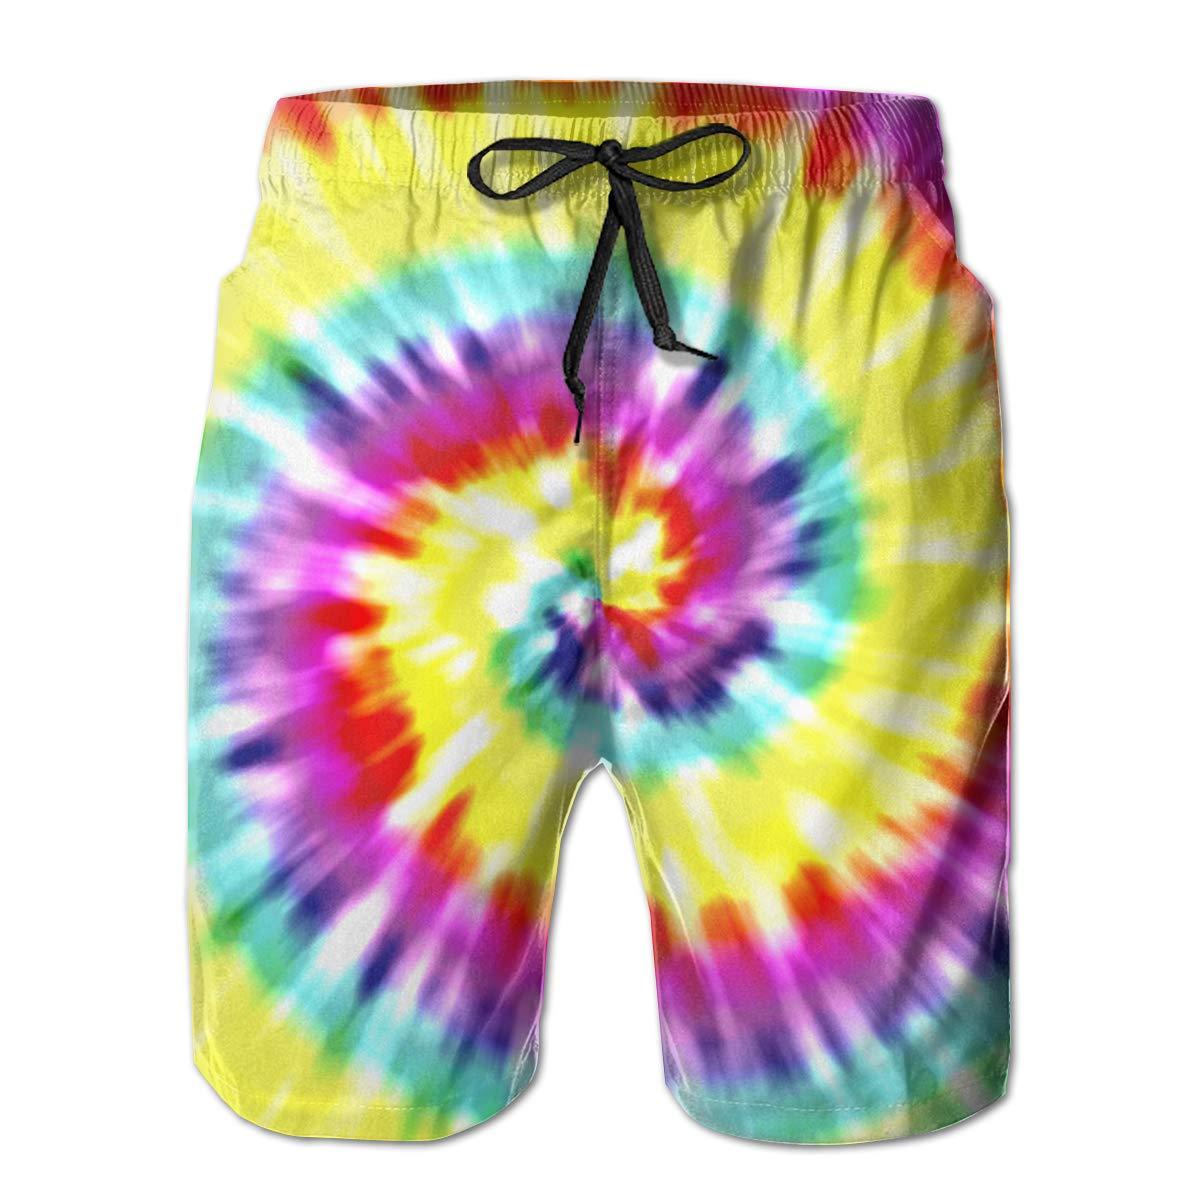 Mens Swim Trunks Unique Tye Dye Art Quick Dry Drawstring Surfing Beach Board Shorts with Pockets